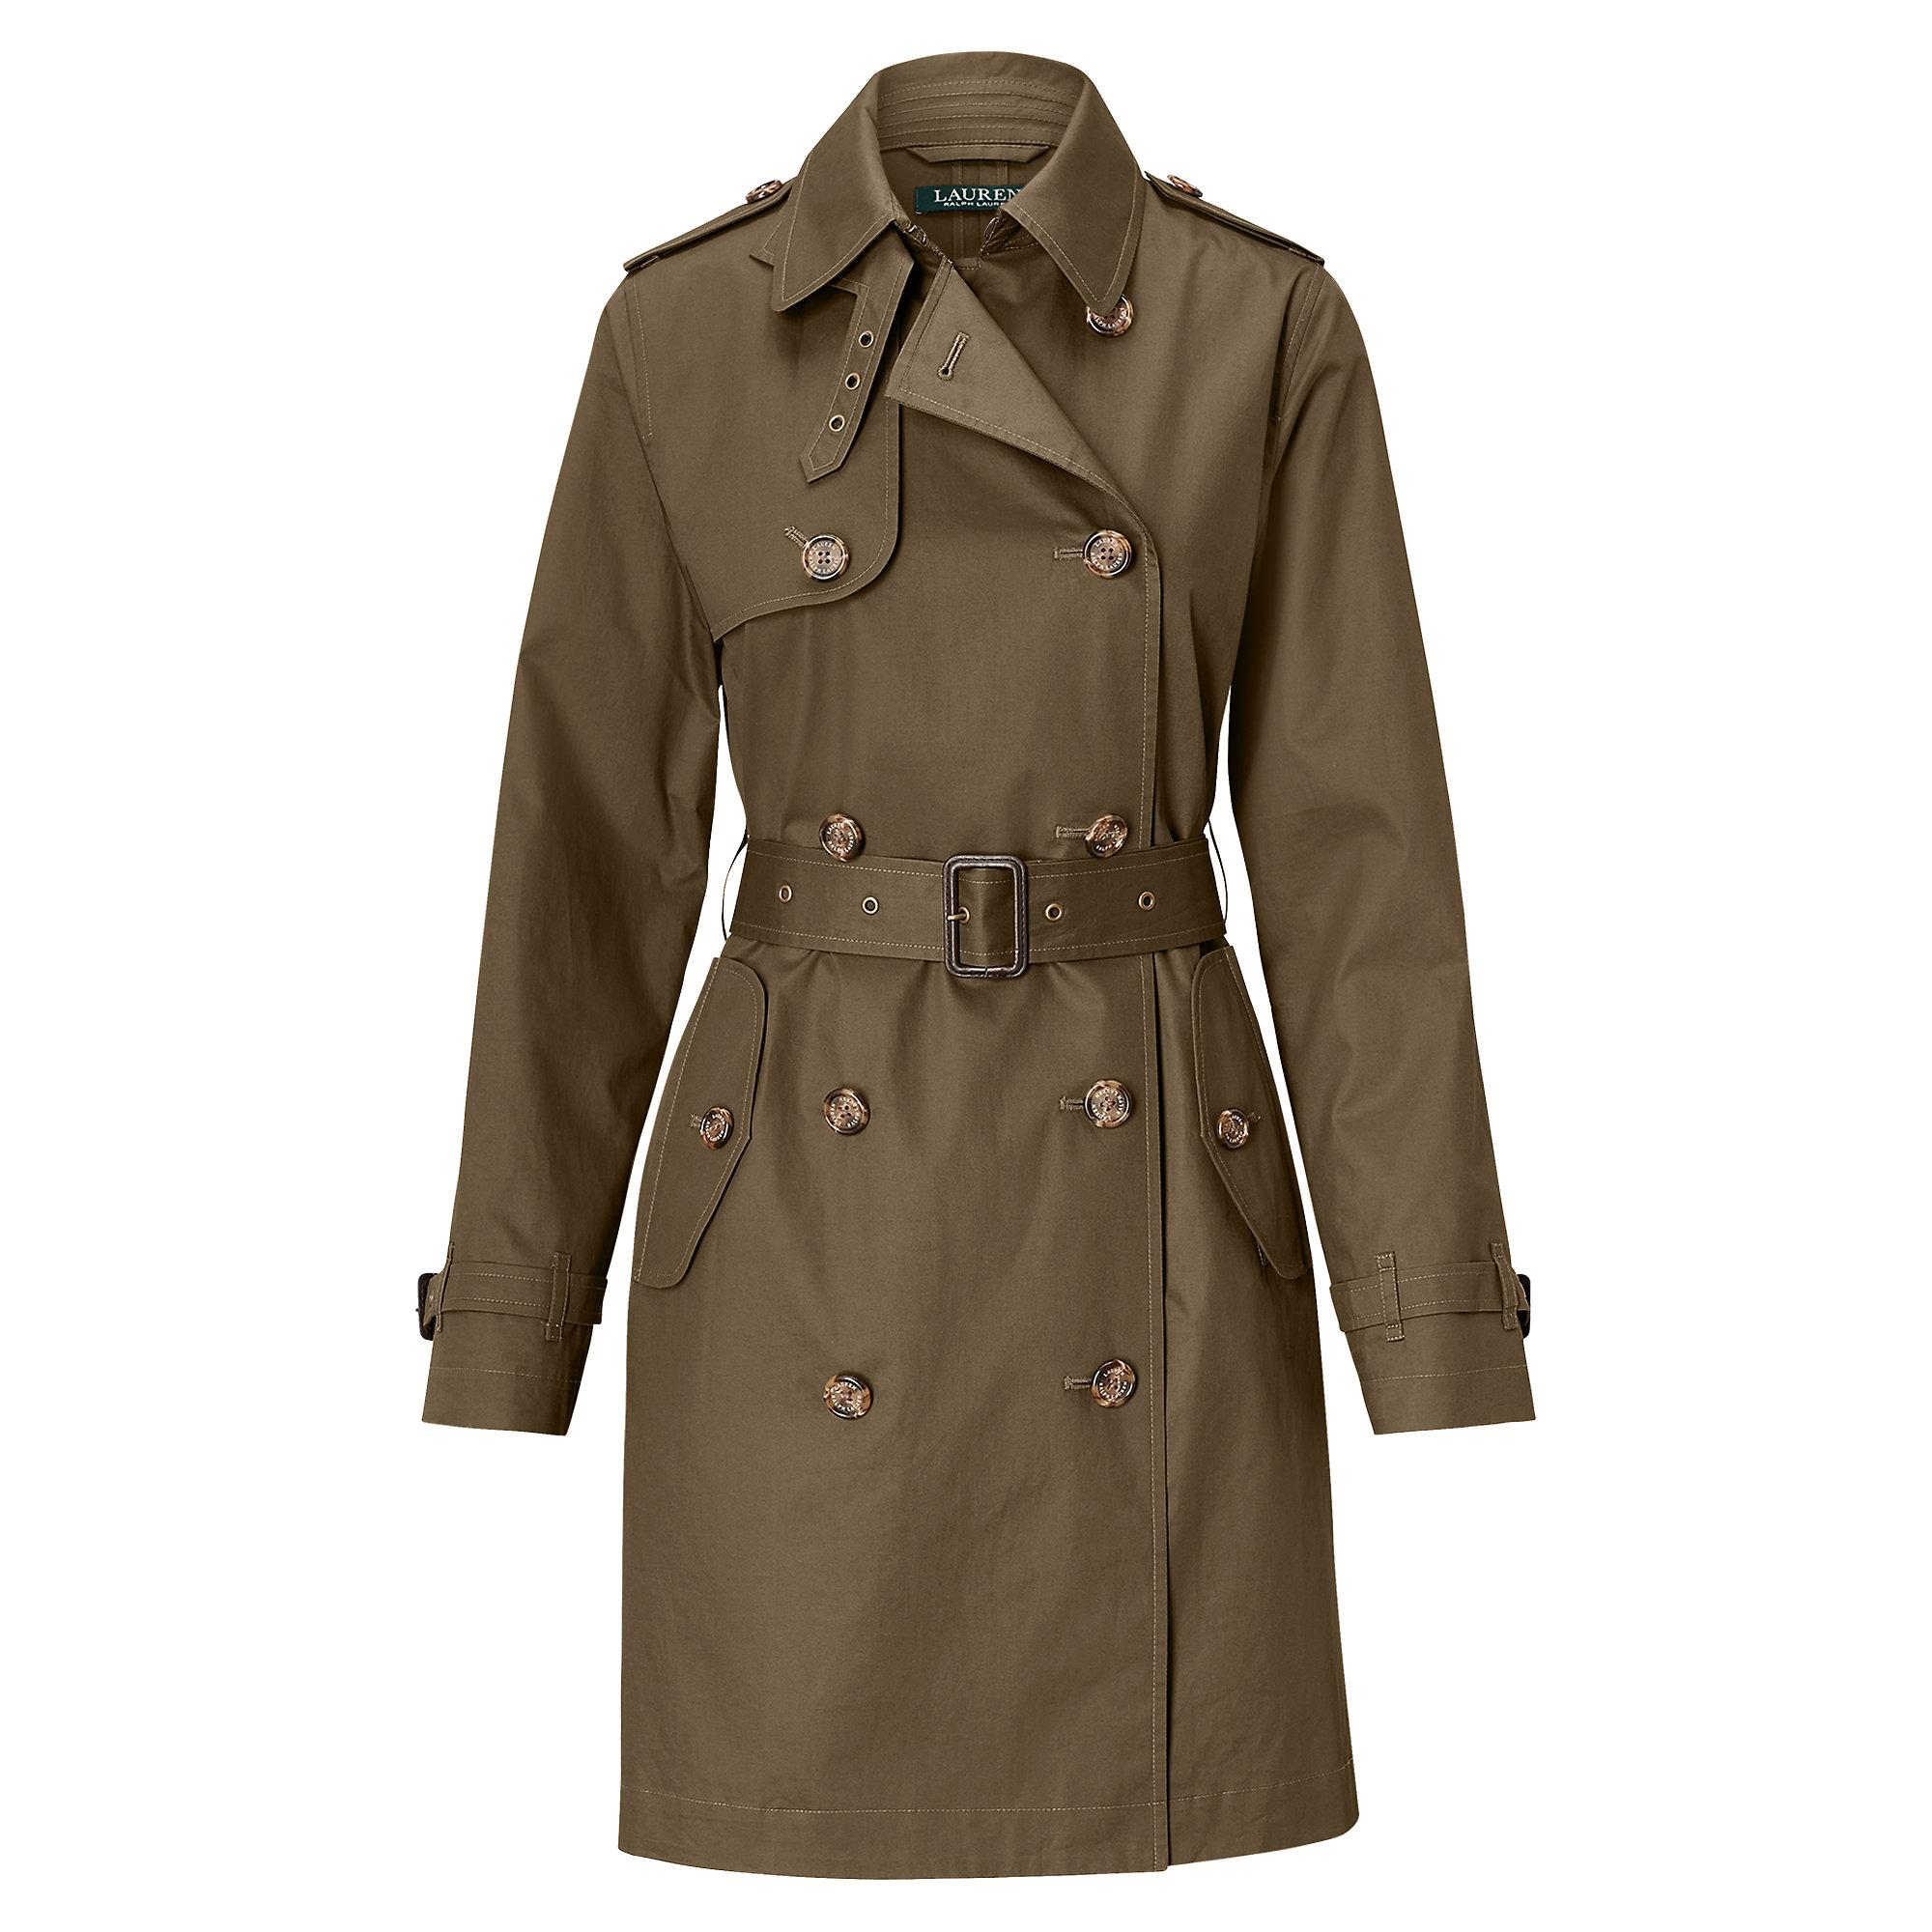 4d71b33d6b lauren by ralph lauren coat kingston belted trench raincoat polo ...